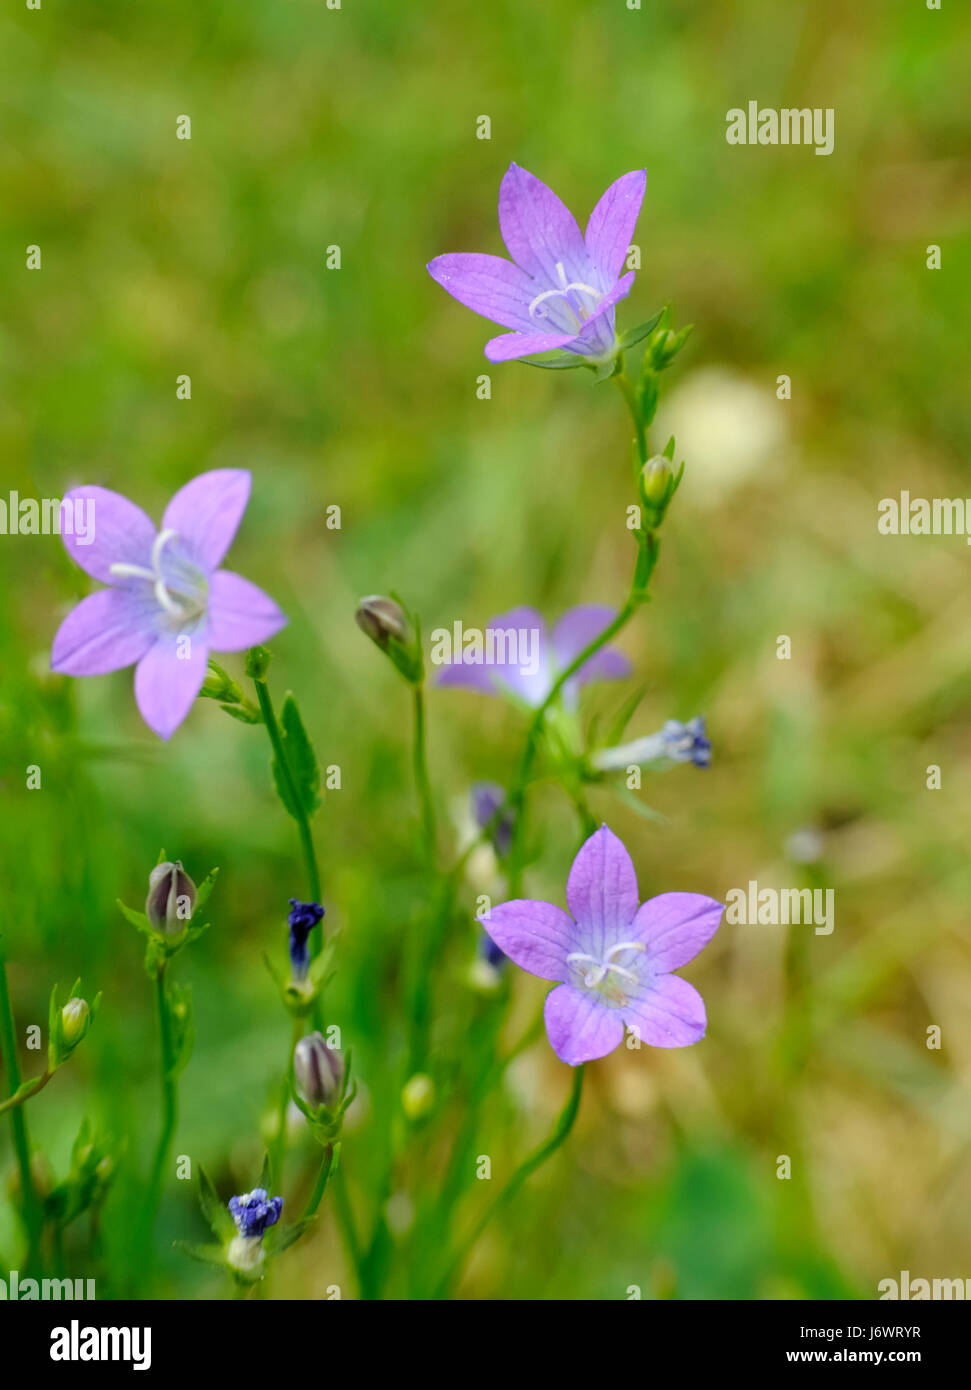 Flower Plant Bloom Blossom Flourish Flourishing Flora Bellflower